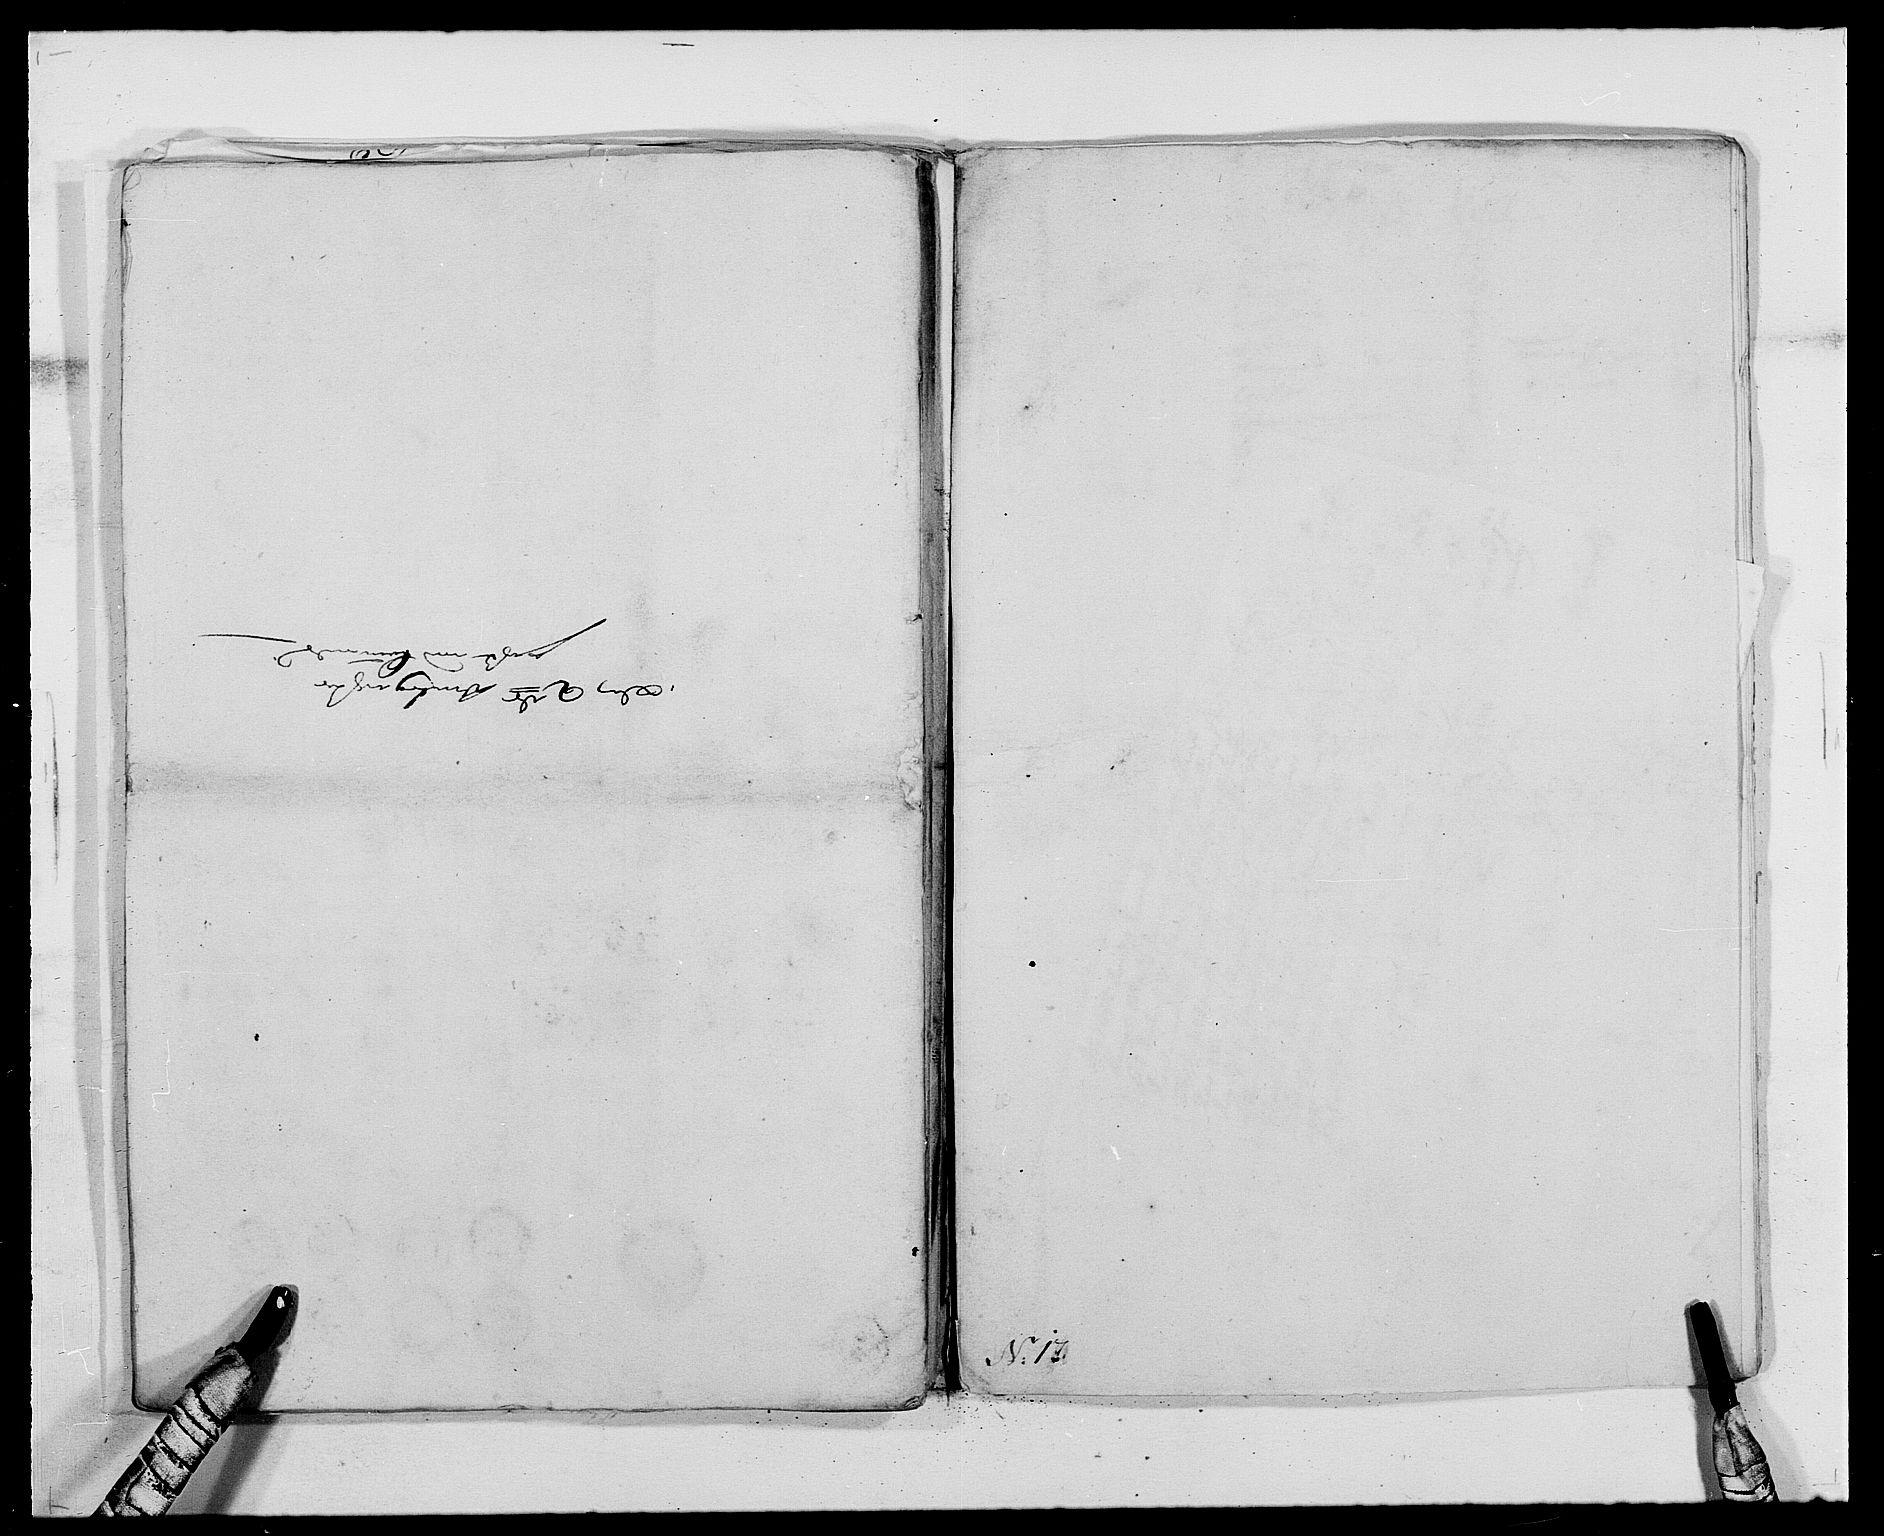 RA, Rentekammeret inntil 1814, Reviderte regnskaper, Fogderegnskap, R41/L2536: Fogderegnskap Lista, 1690-1693, s. 395